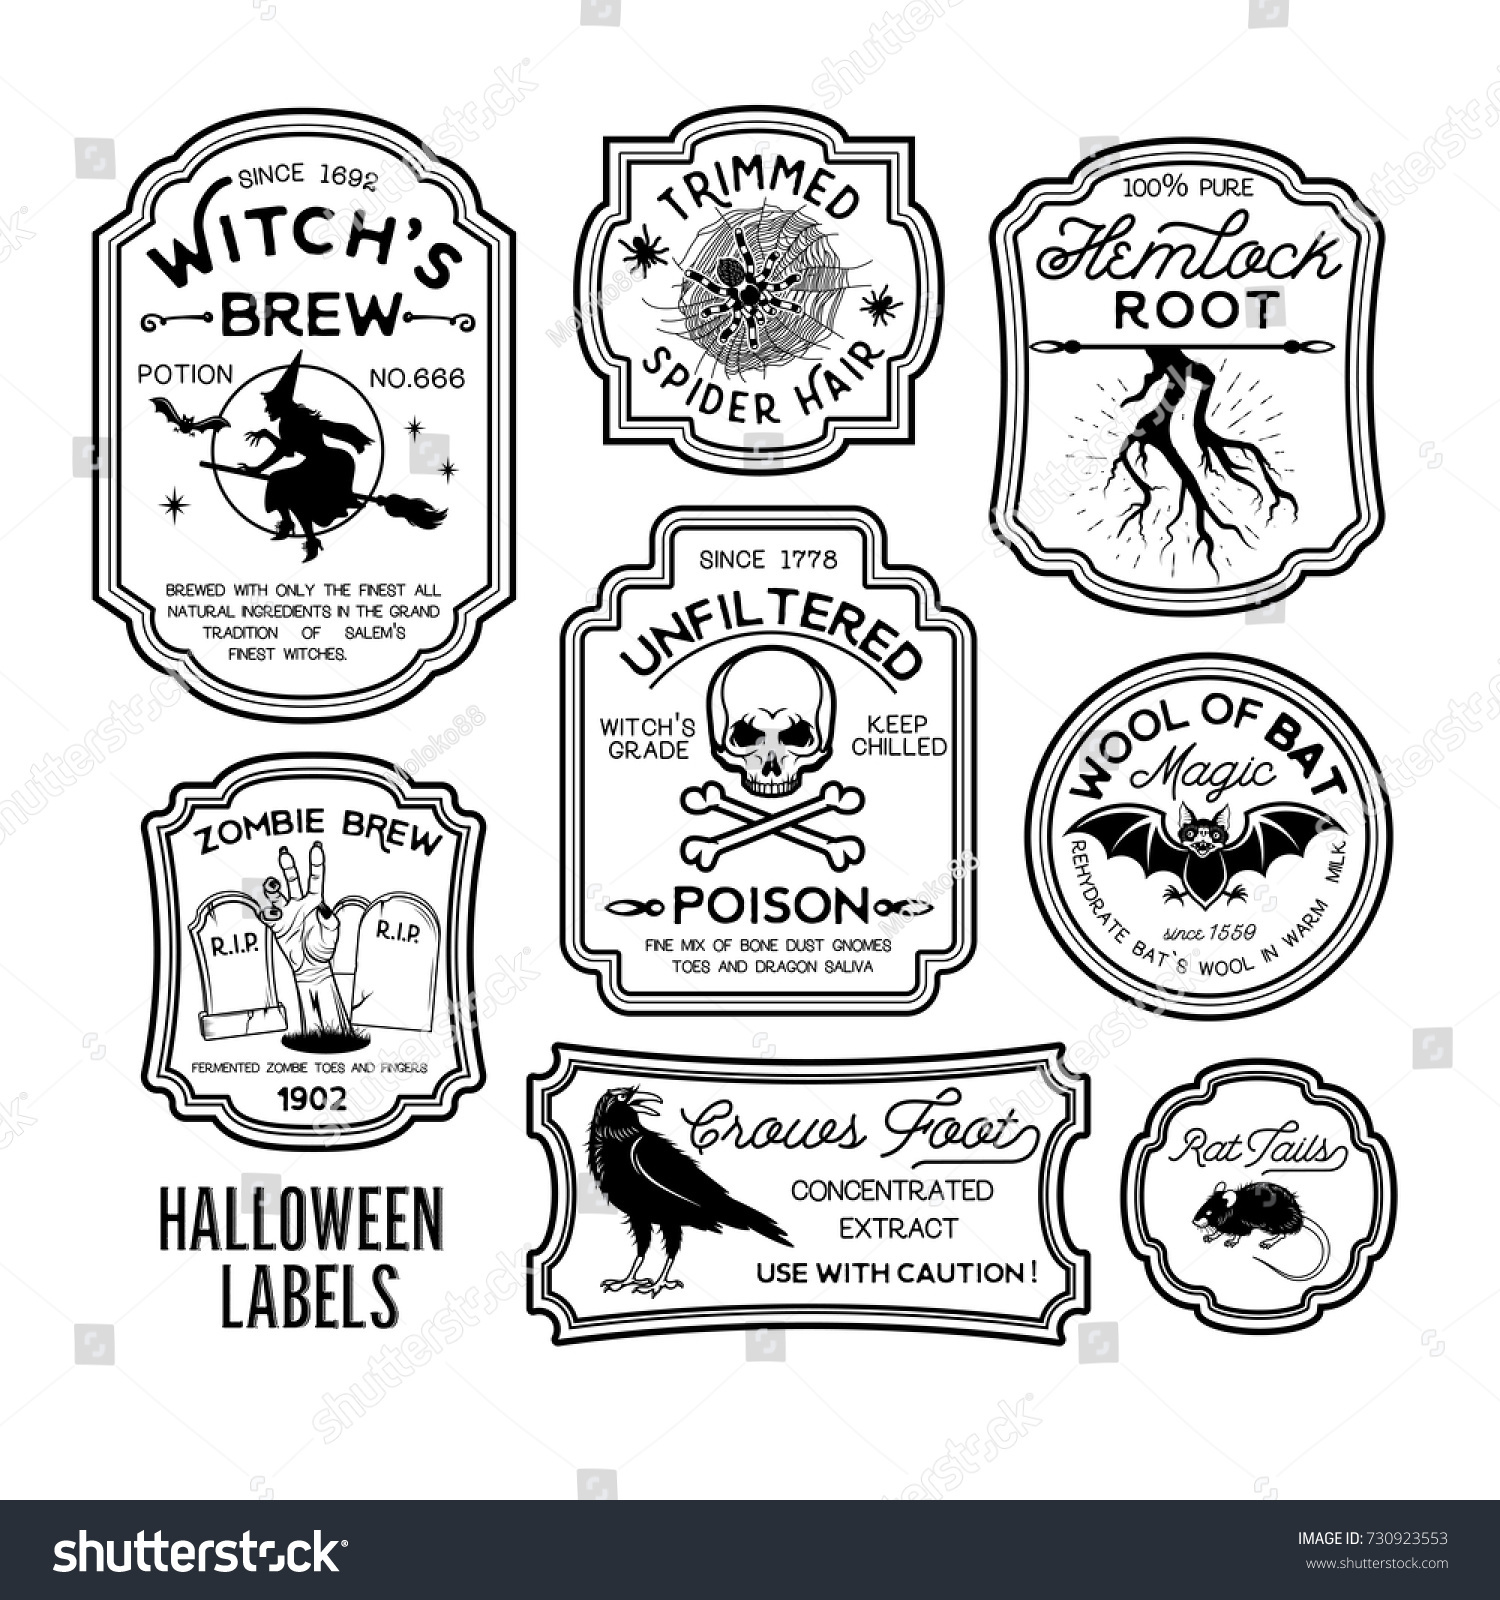 Halloween Potion Worksheets